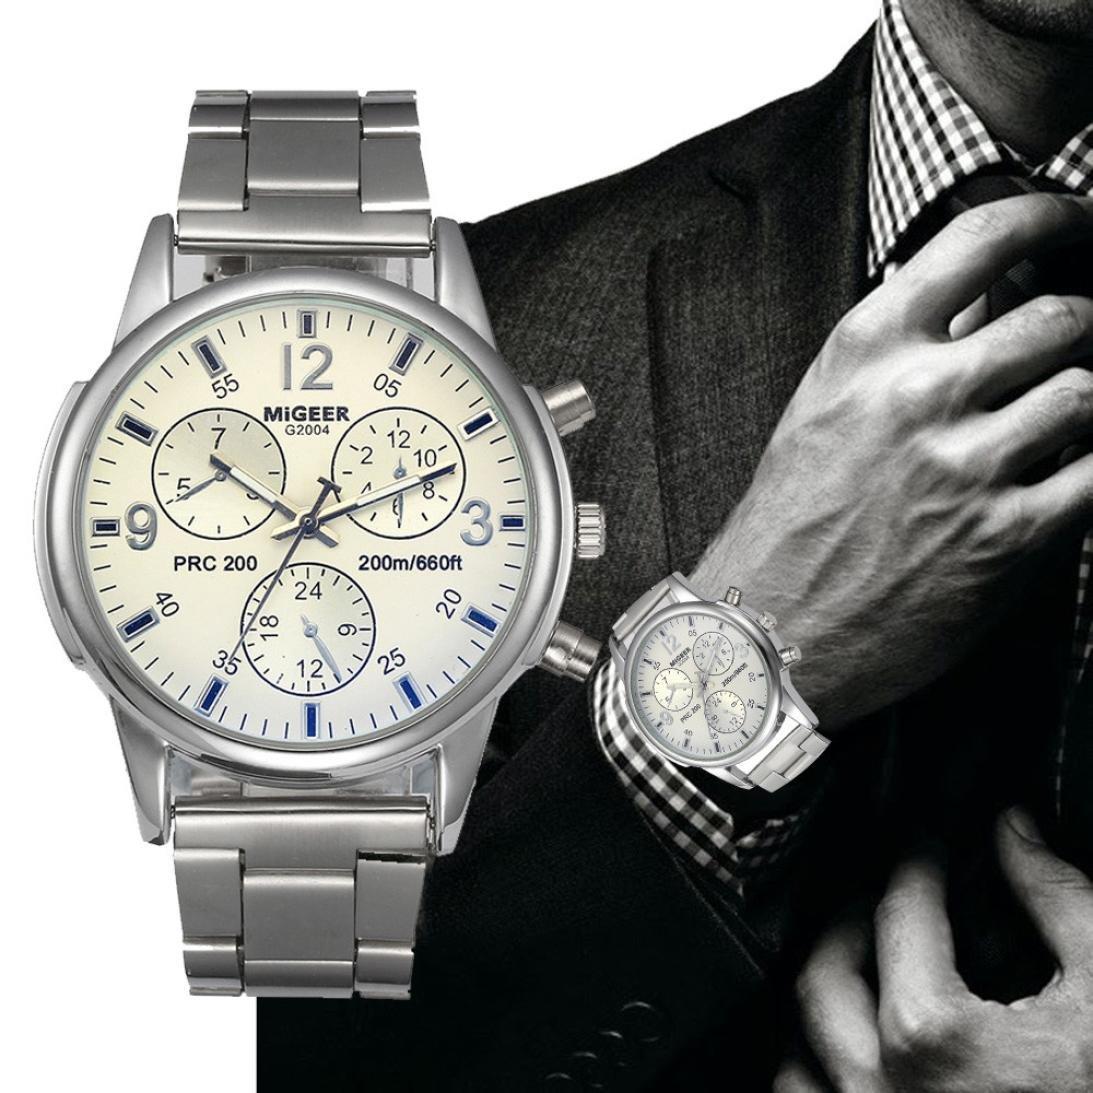 Pocciol Watch, Mens Fashion Crystal Stainless Steel Analog Quartz Wristwatch Simple Watches (White)